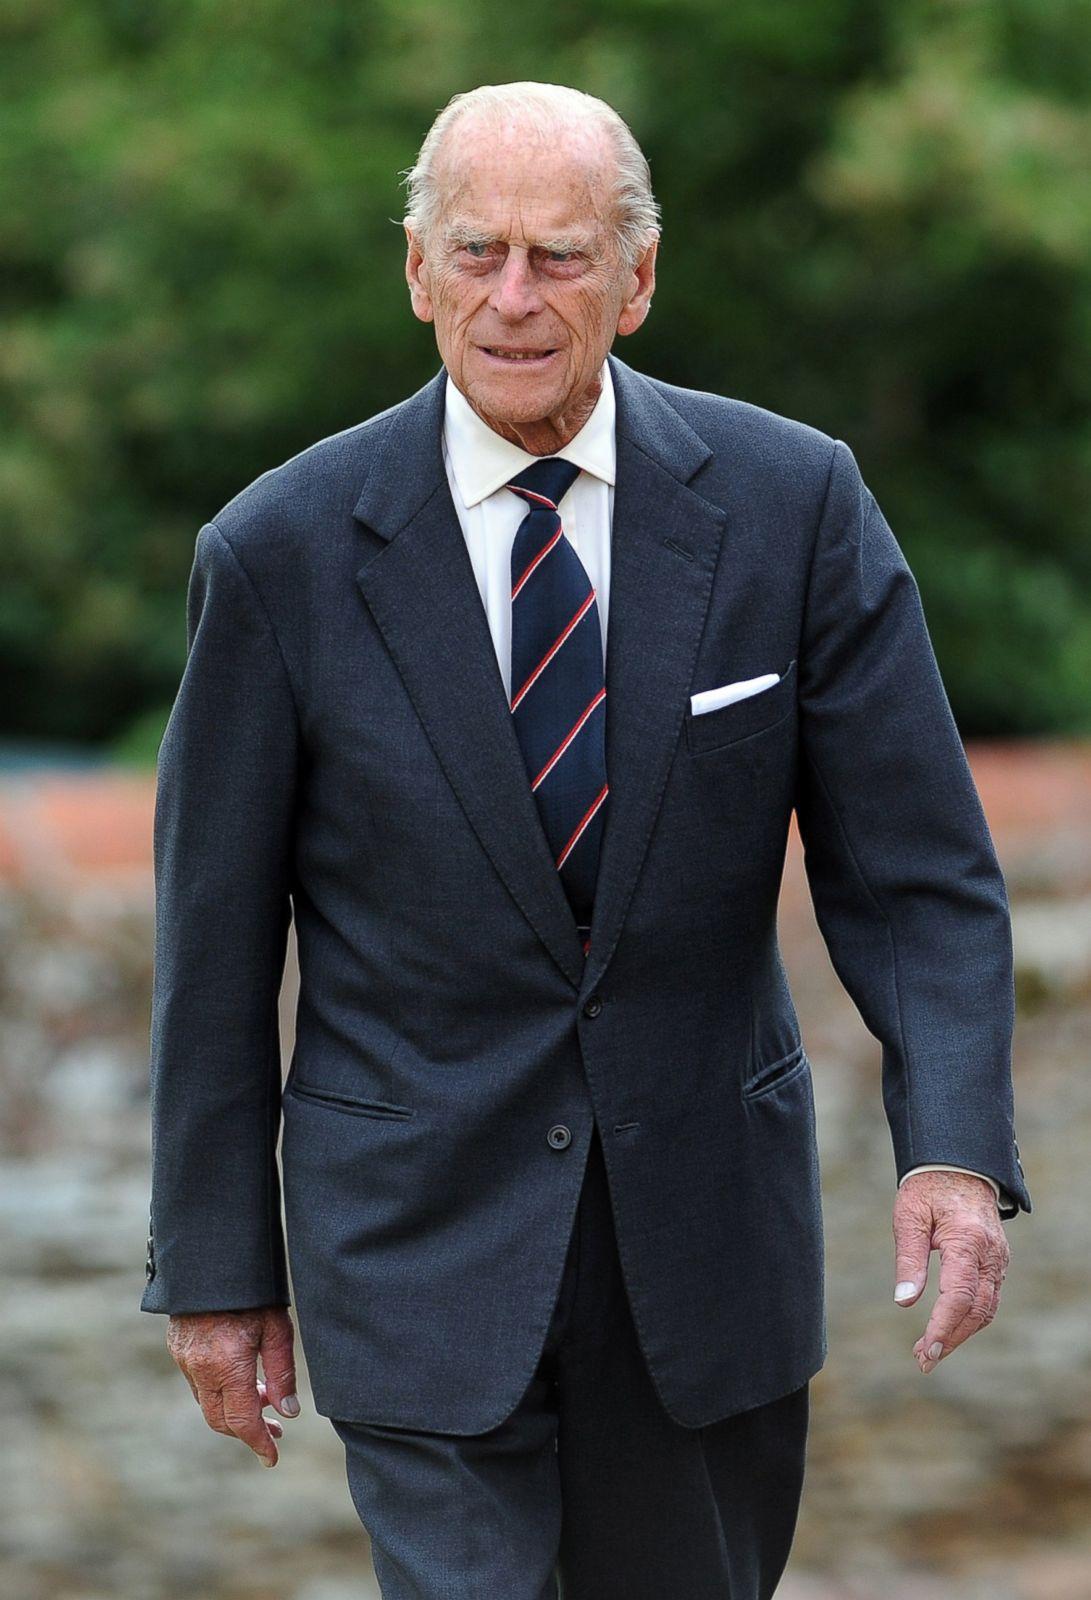 Prince Philip through the years Photos | Image #24 - ABC News